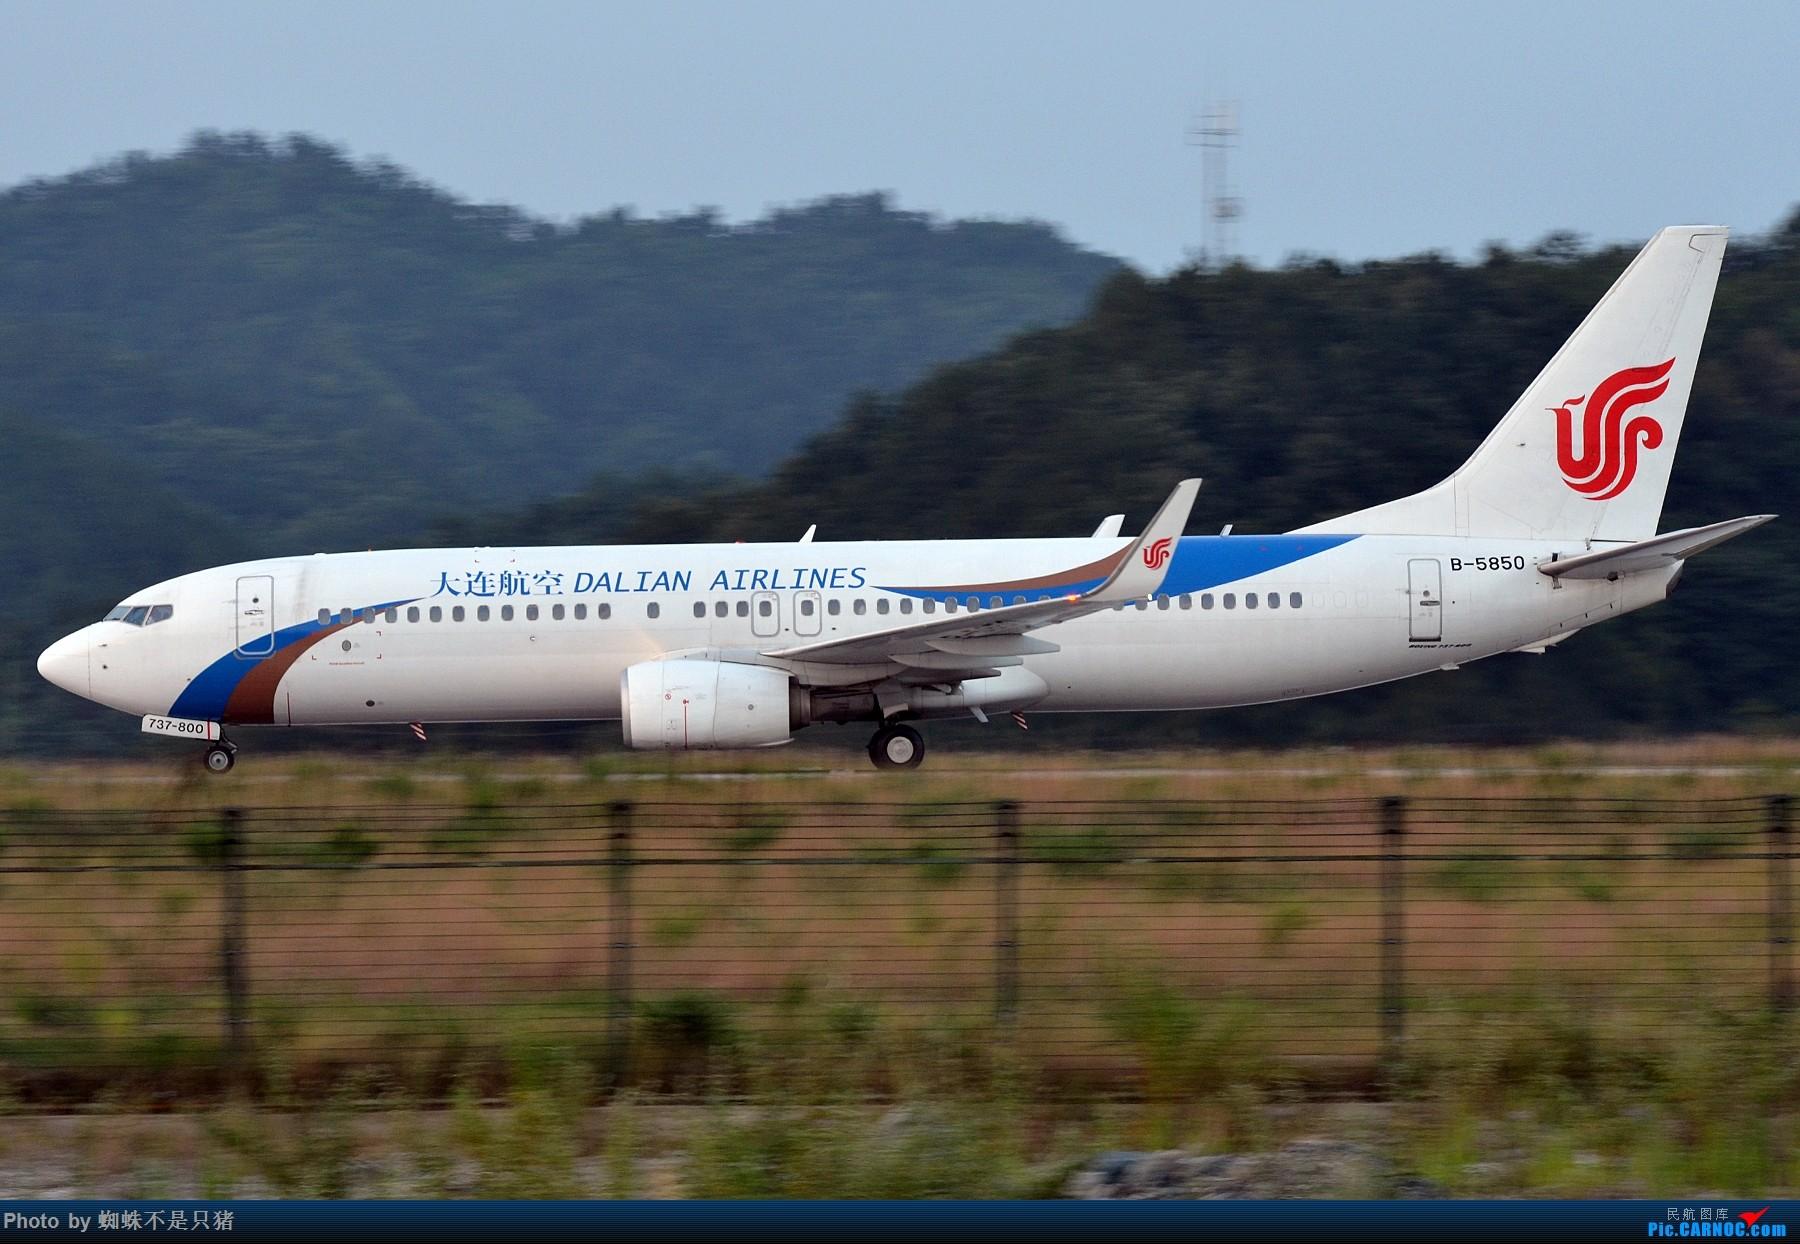 Re:[原创]十堰武当山机场 少见的还在坚守的运-5以及一些杂图 BOEING 737-800 B-5850 中国十堰武当山机场